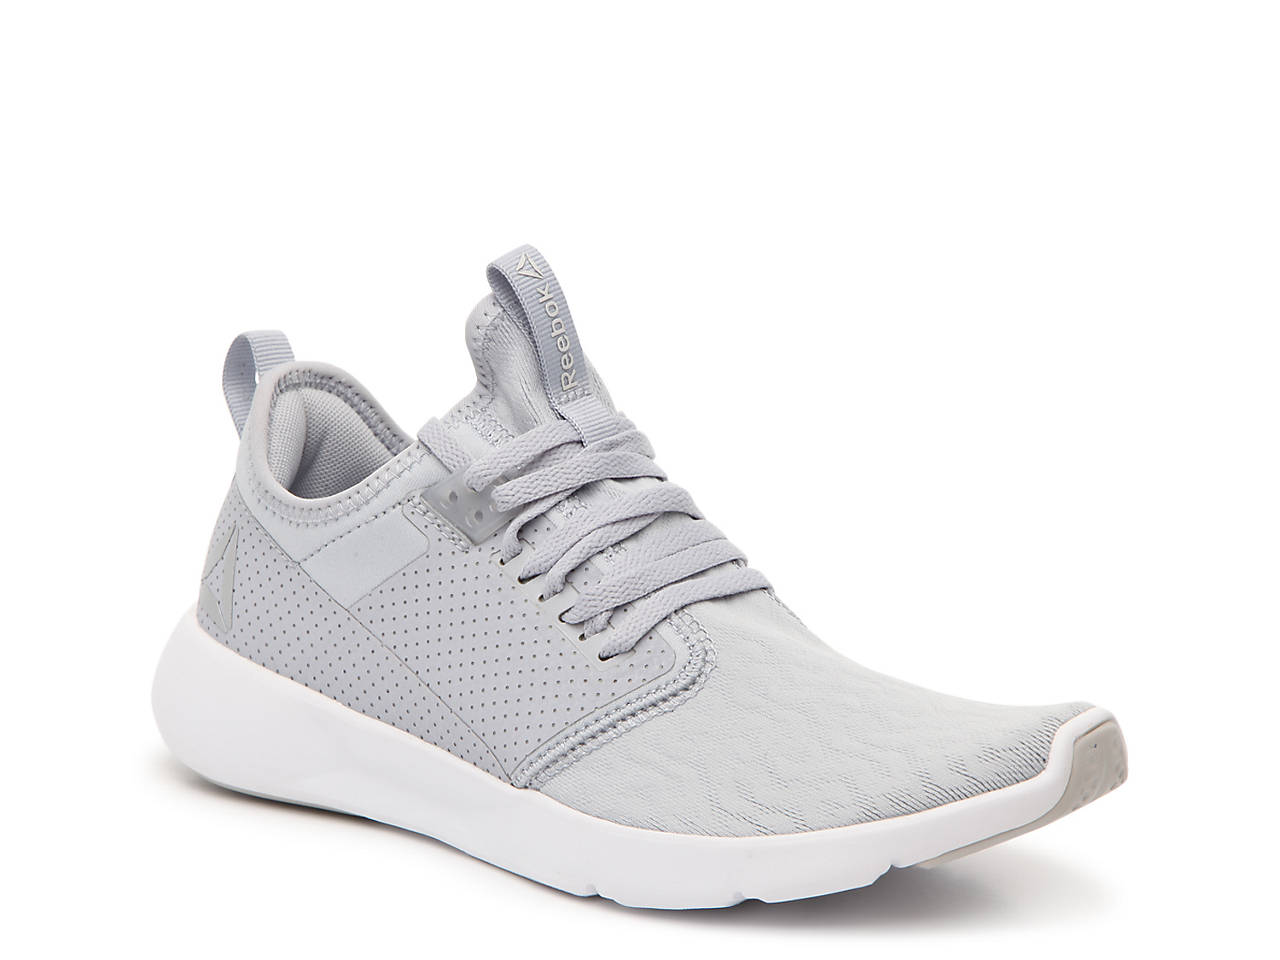 a3f471f0ad9 Reebok Plus Lite 2 Lightweight Running Shoe - Women s Women s Shoes ...